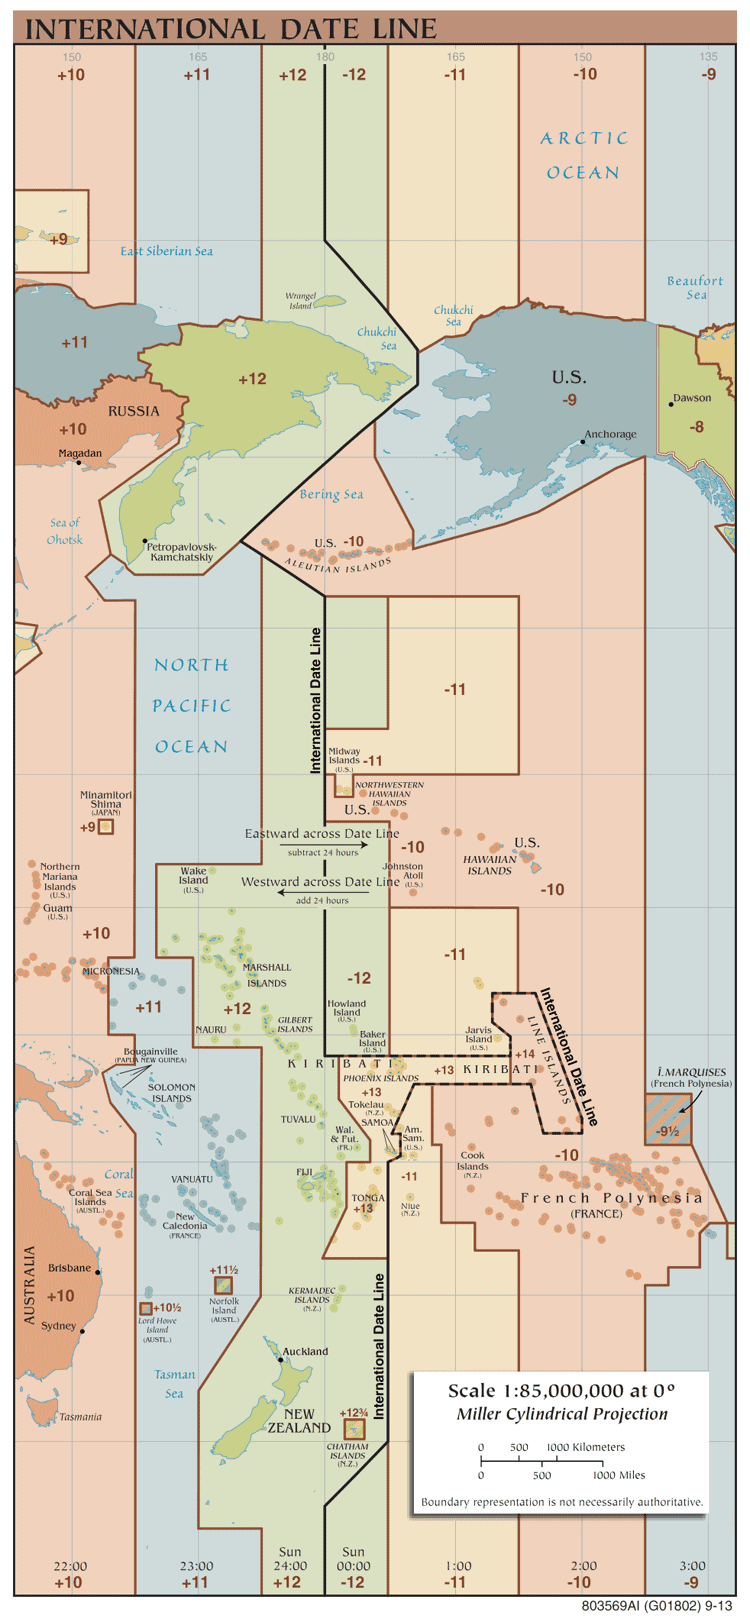 Map showing the International Date Line.  Source: Jailbird, GNU Free Documentation License, Wiki Commons, 2014.